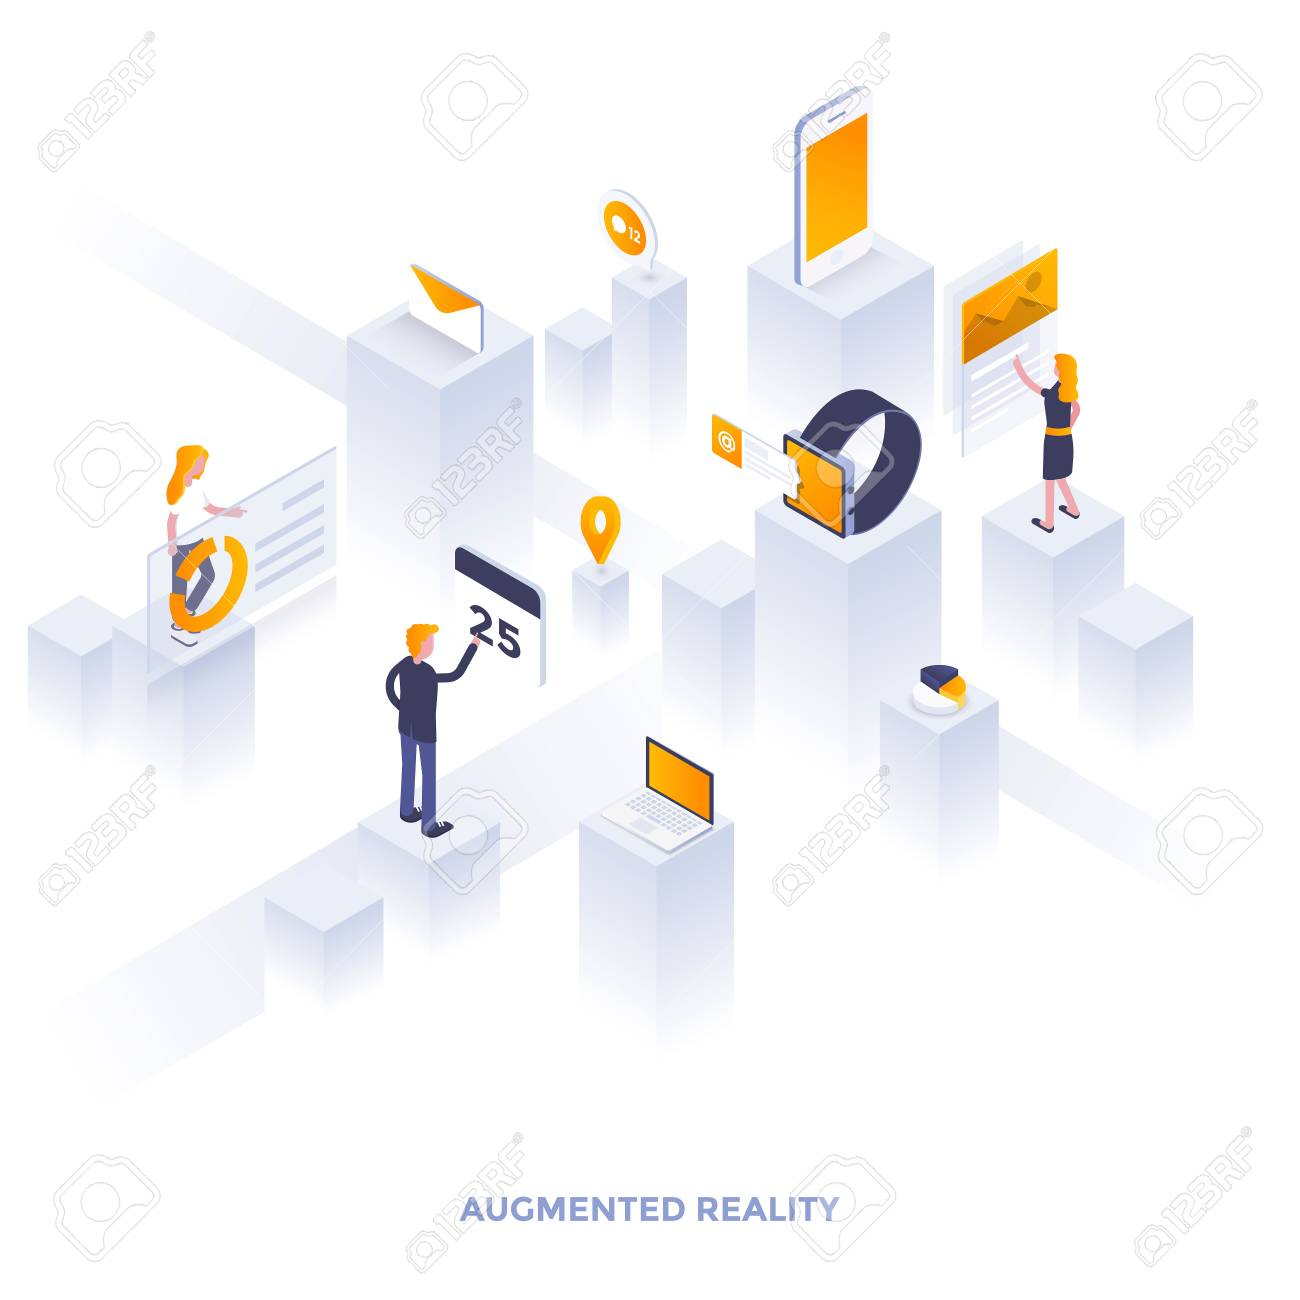 Modern flat design isometric illustration of Augmented Reality